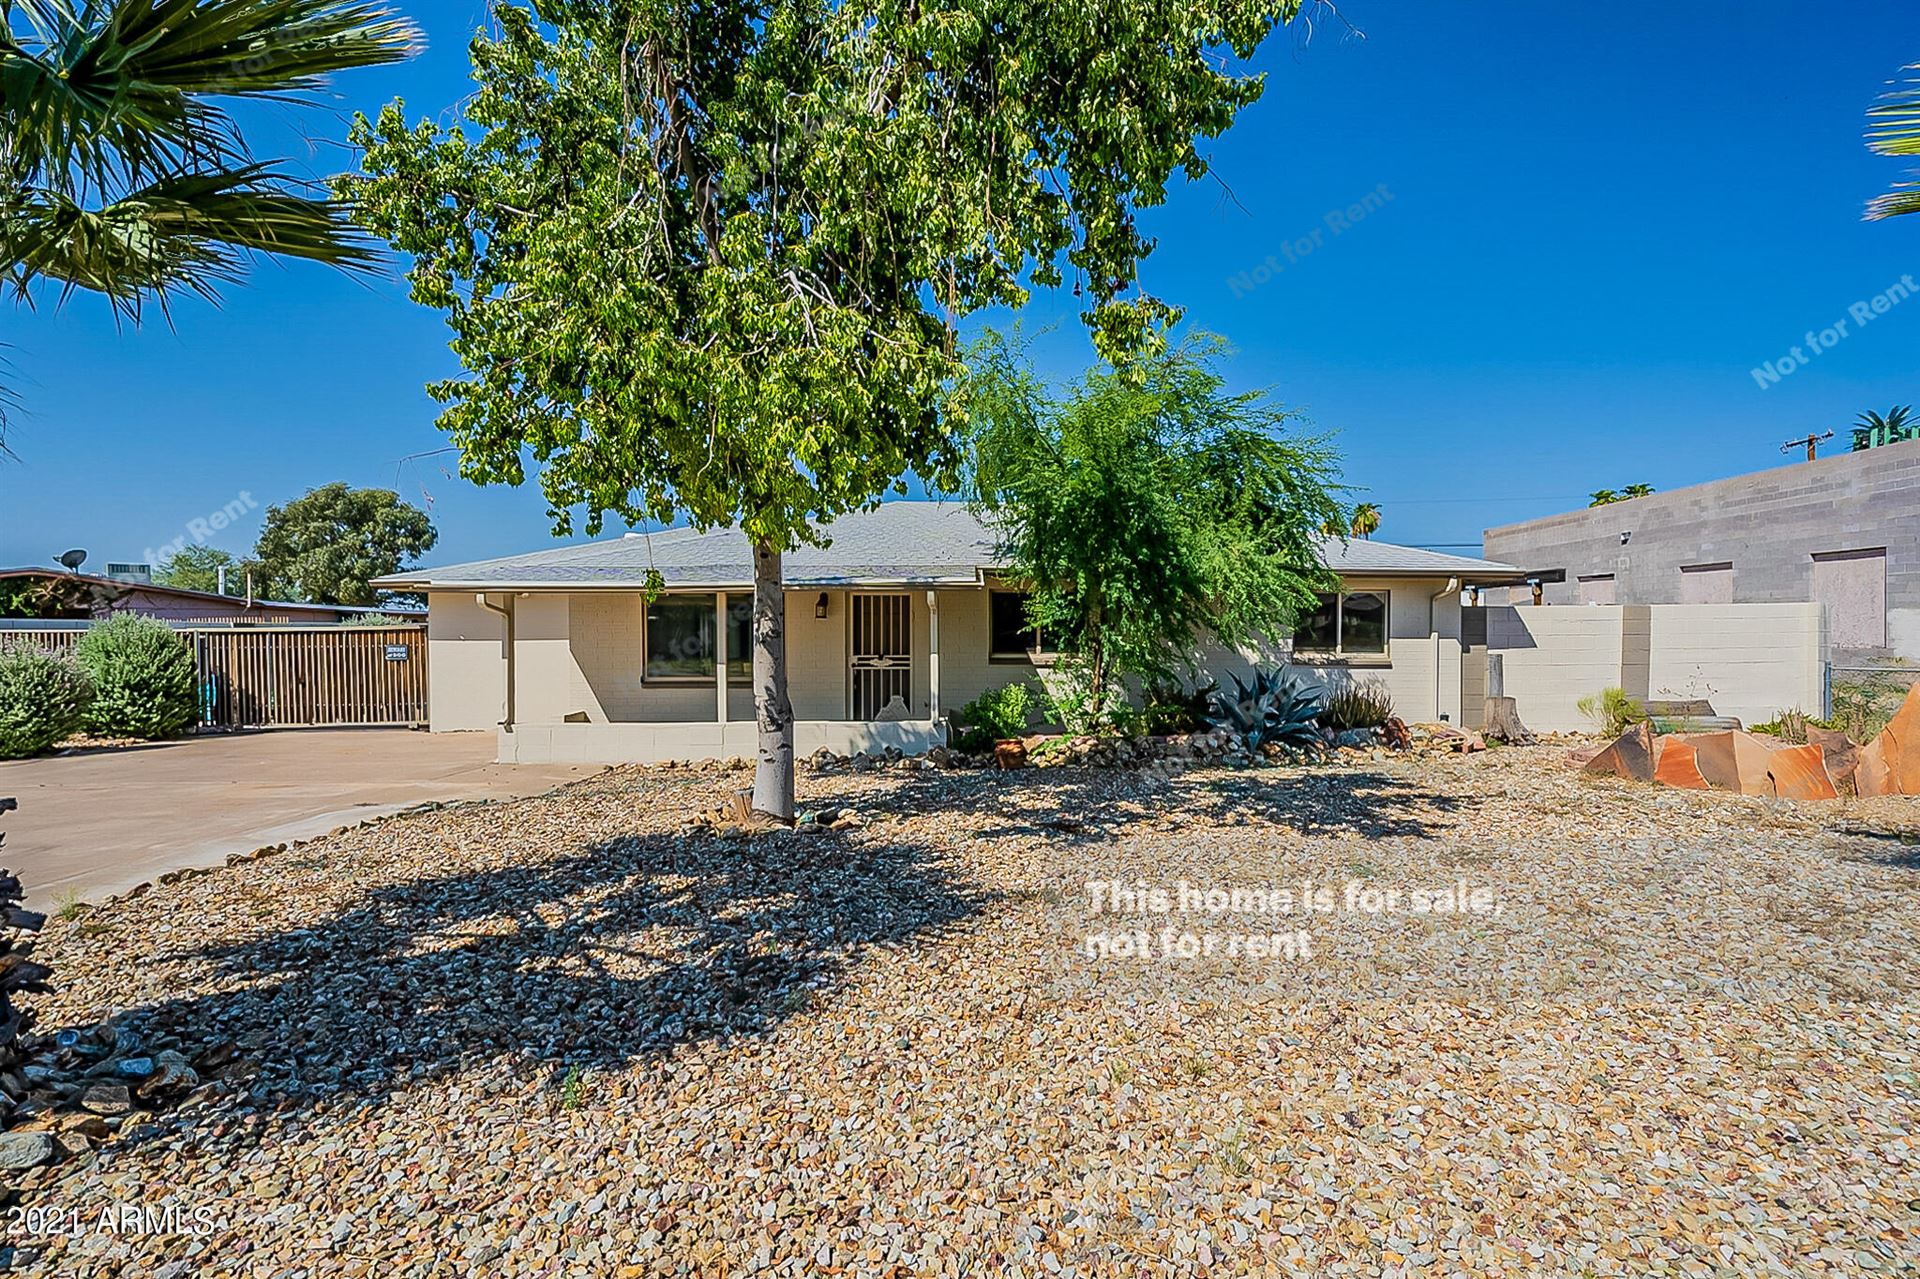 16832 N 17TH Street, Phoenix, AZ 85022 - MLS#: 6293875